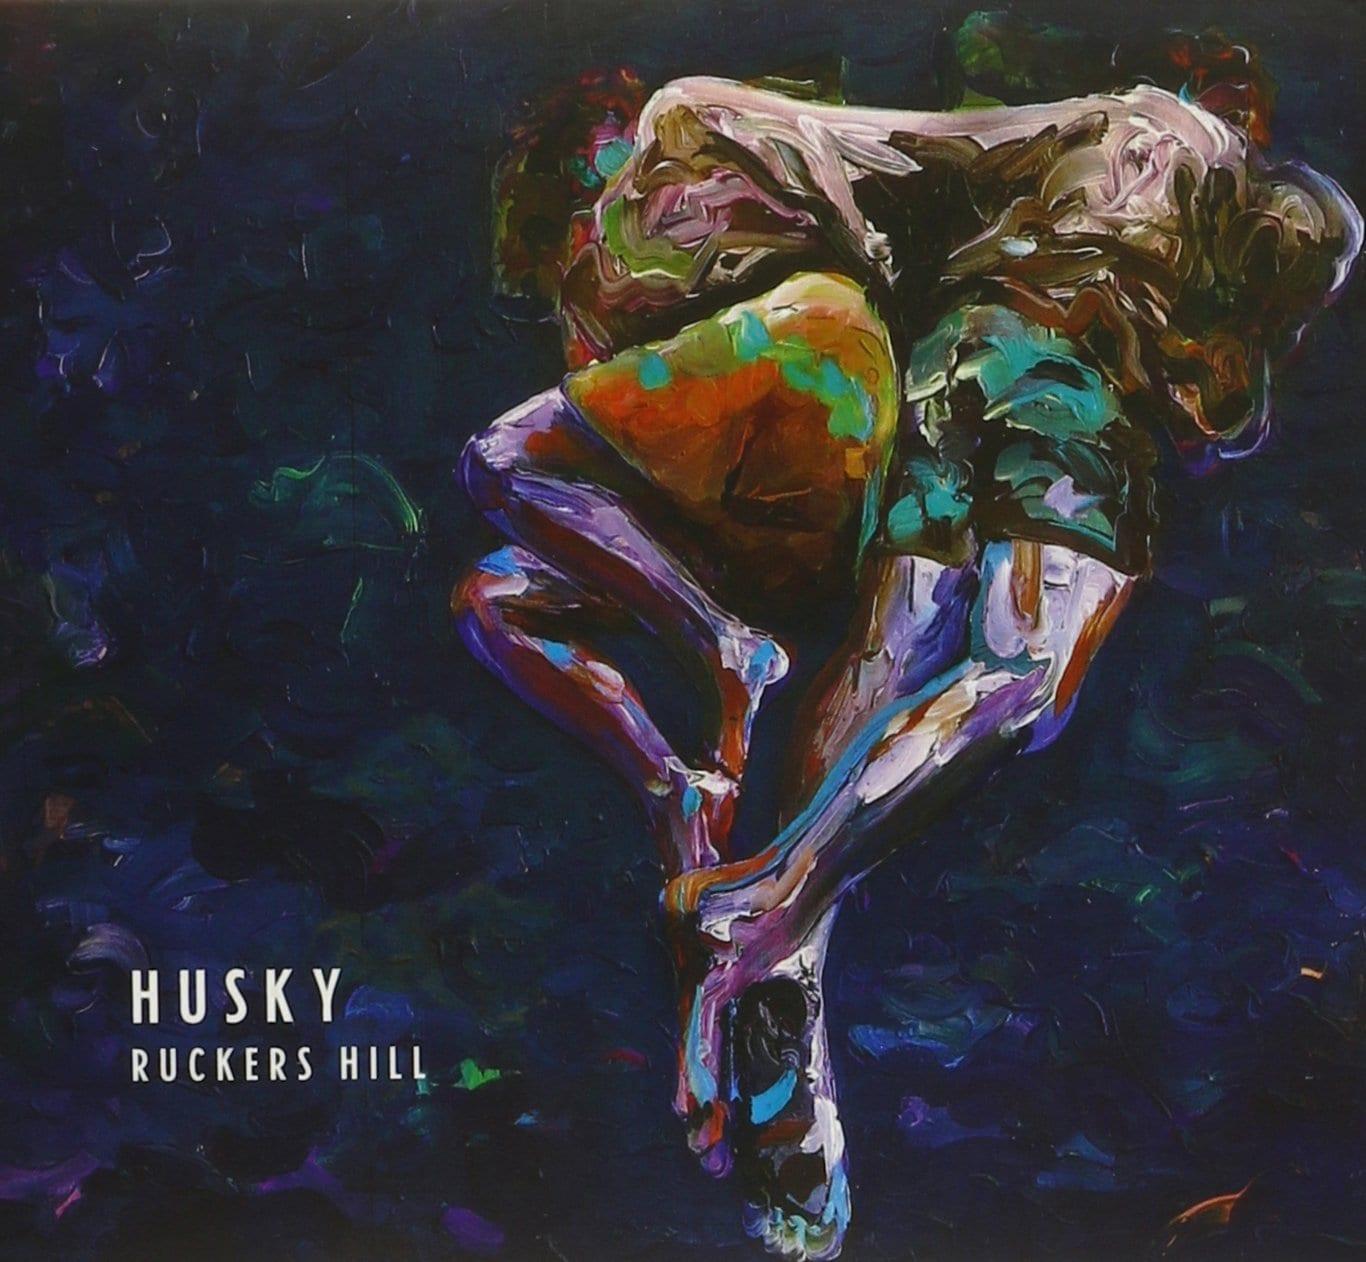 husky ruckers hill